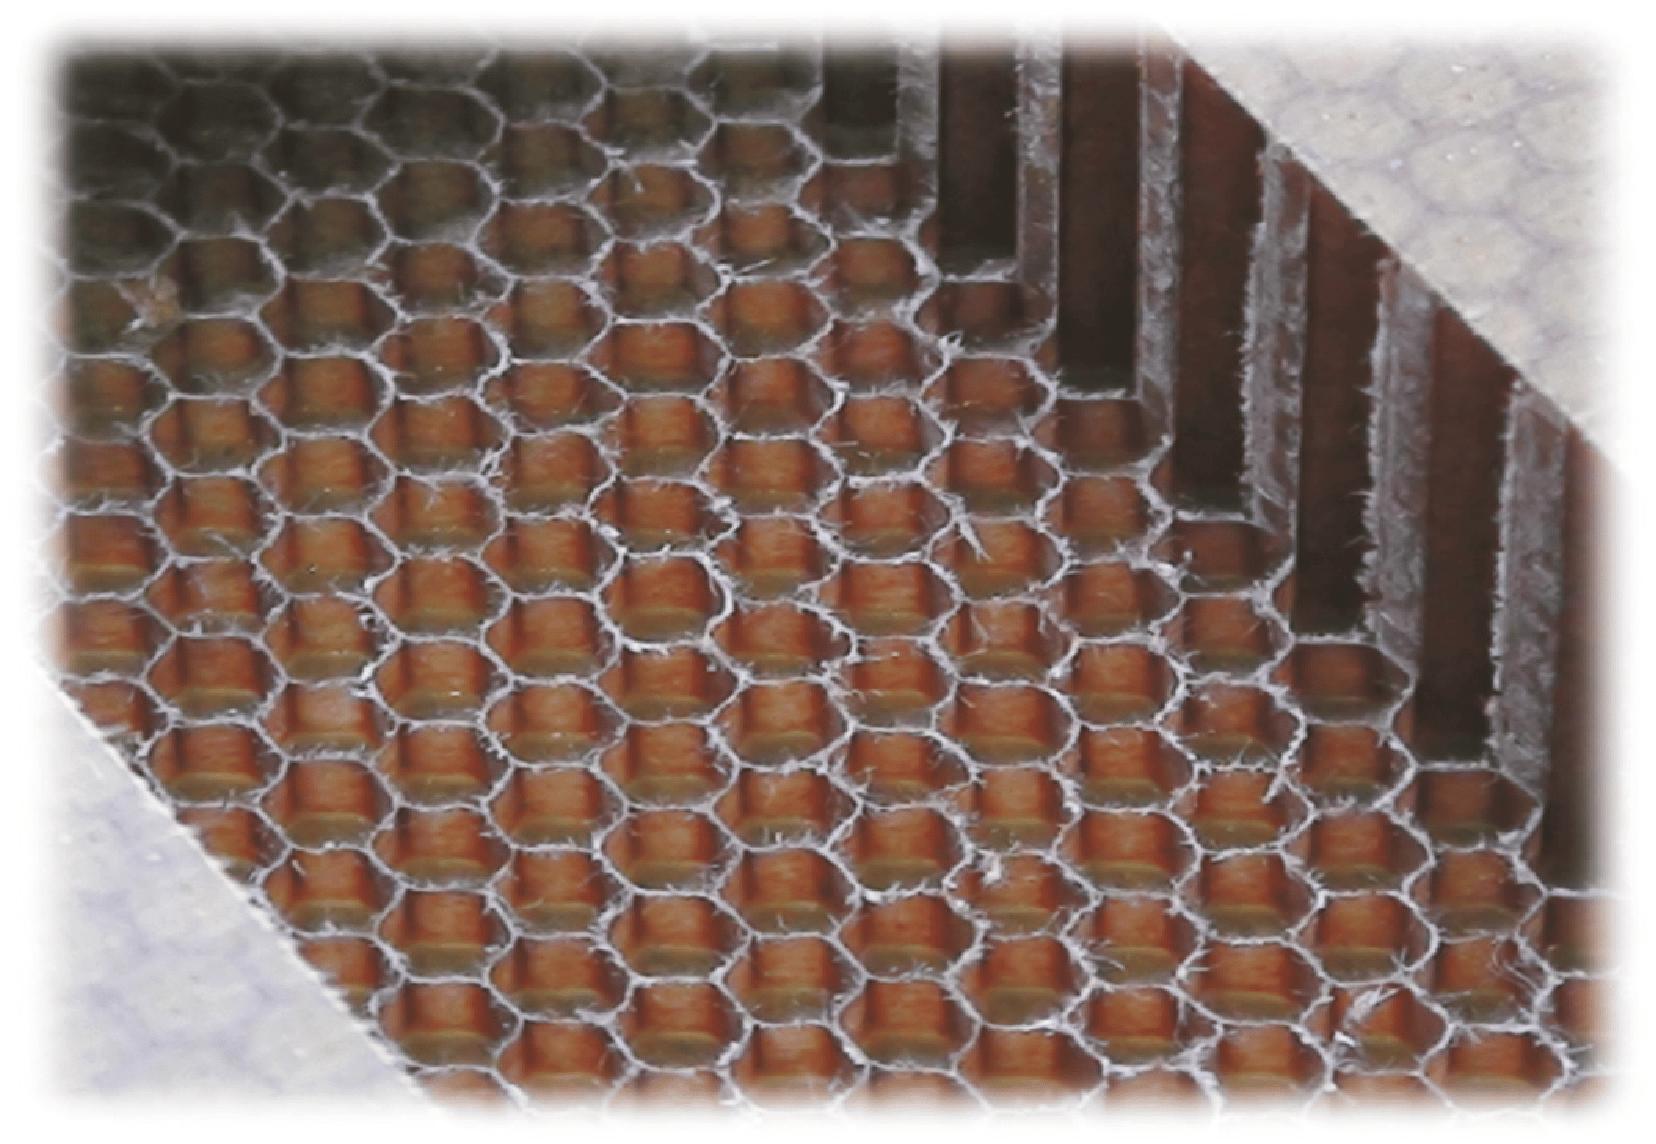 hufschmied-frese-punte-compositi-plastica-4-01